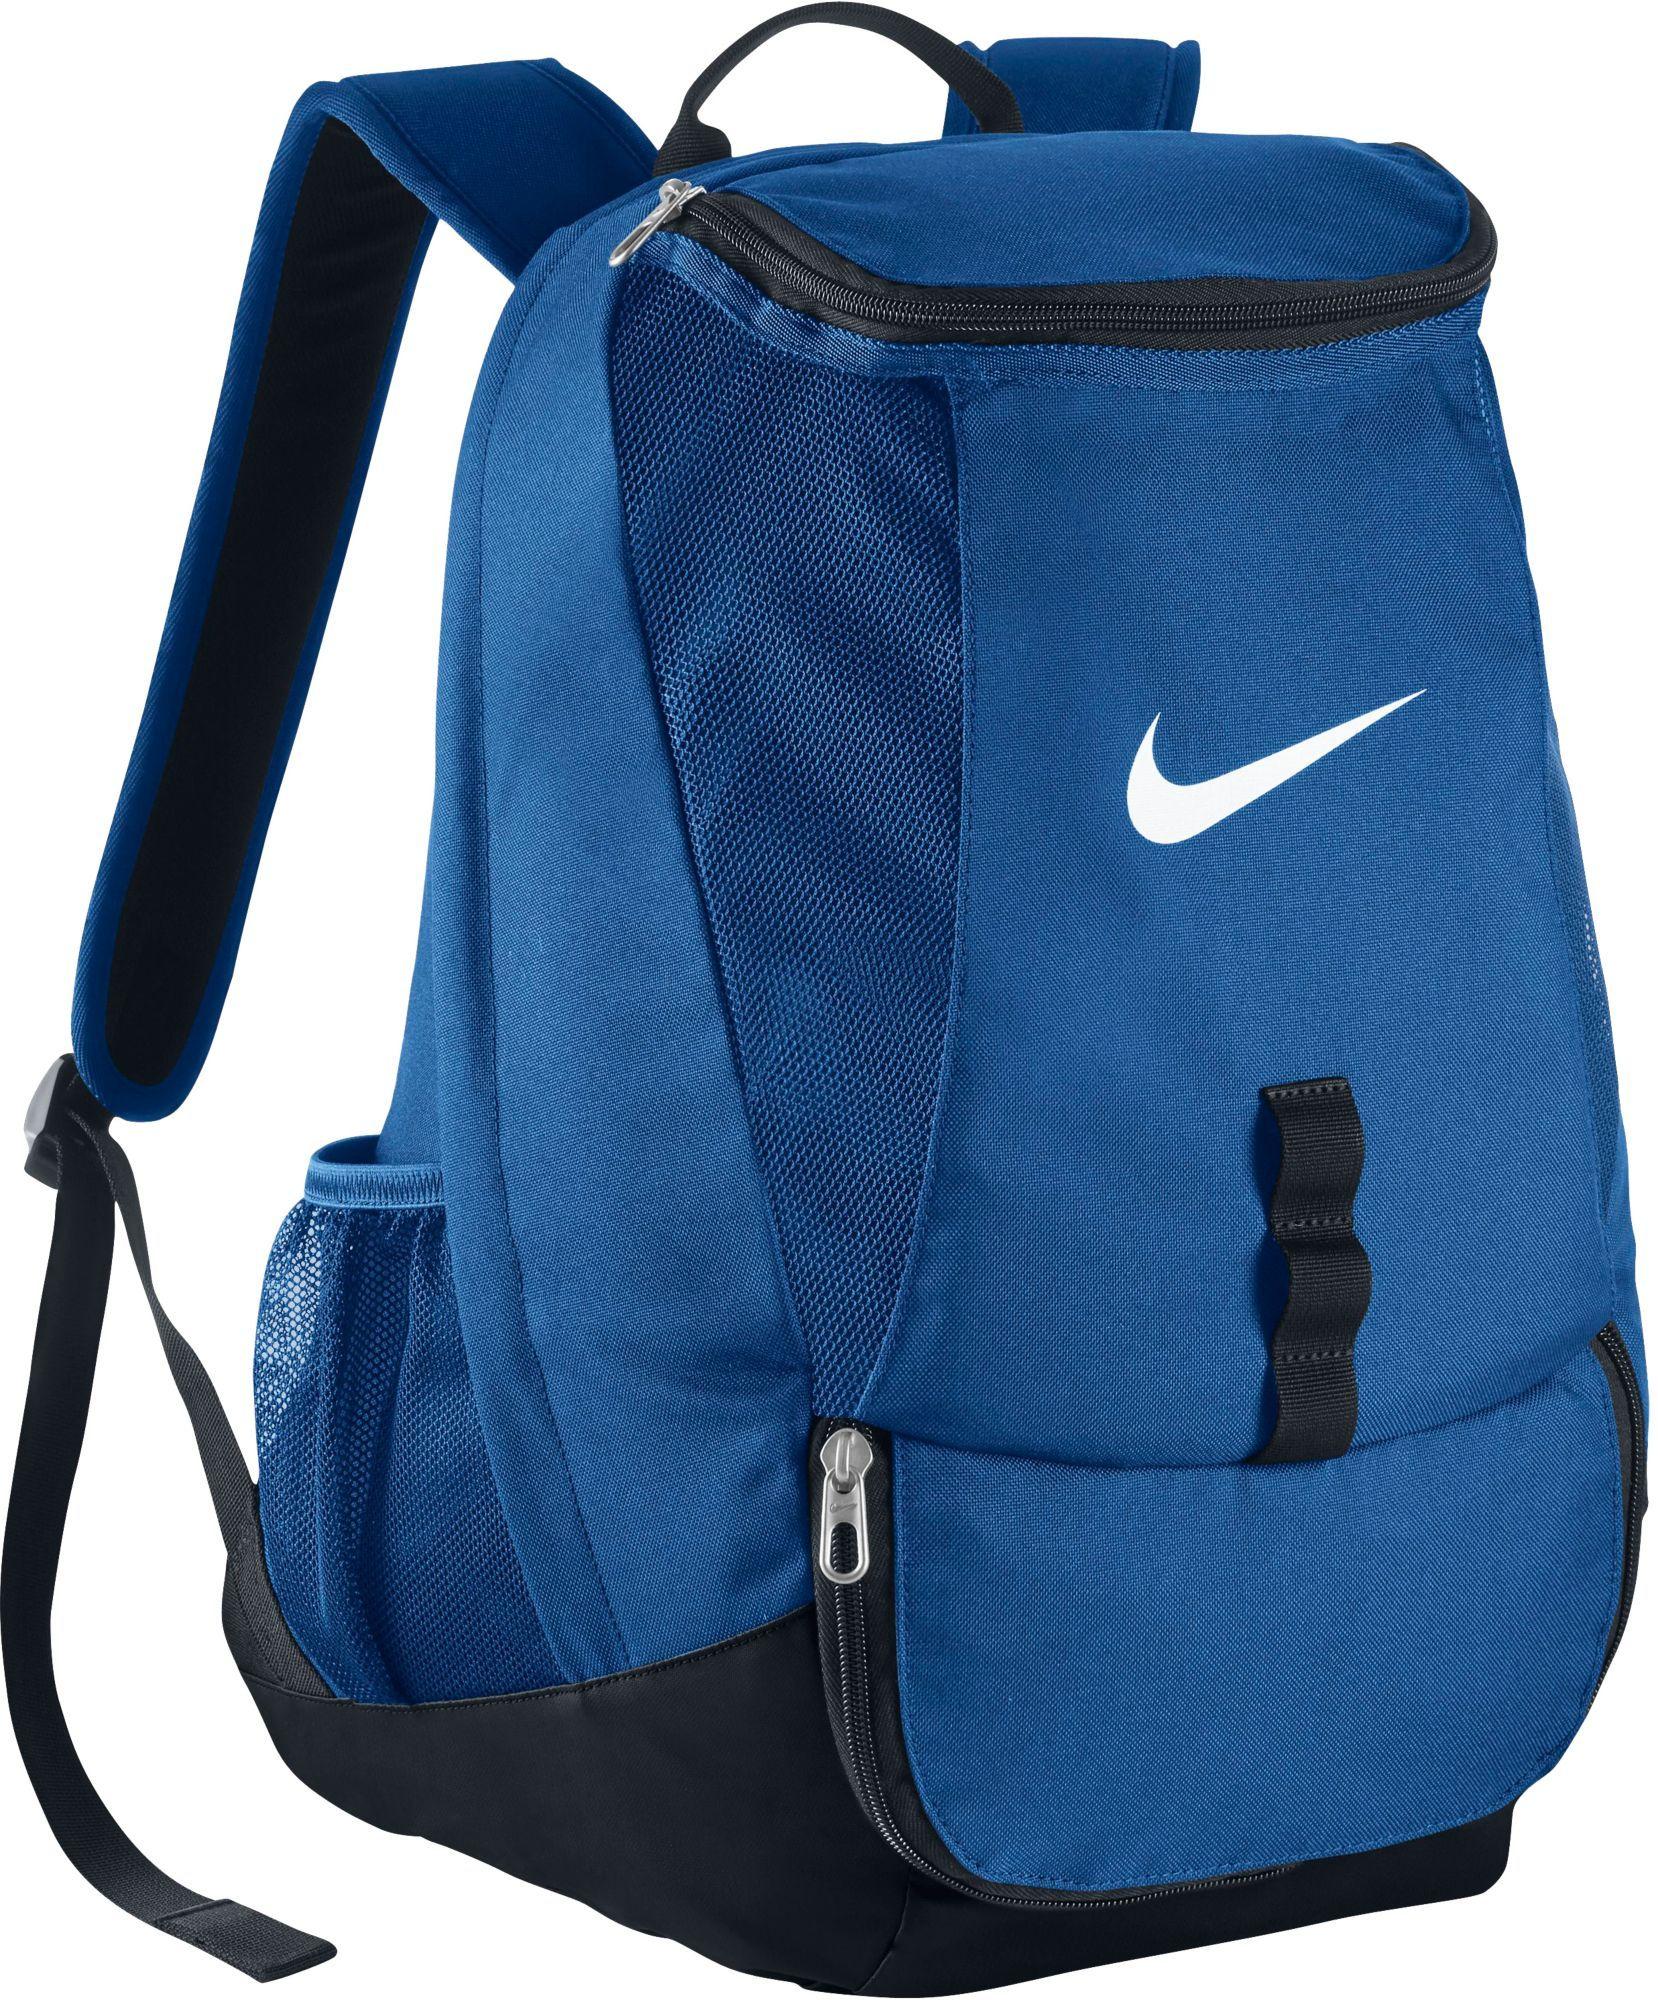 Club Nike Team Swoosh Soccer Backpack Backpacks 2019Products In 7Y6vbfyg